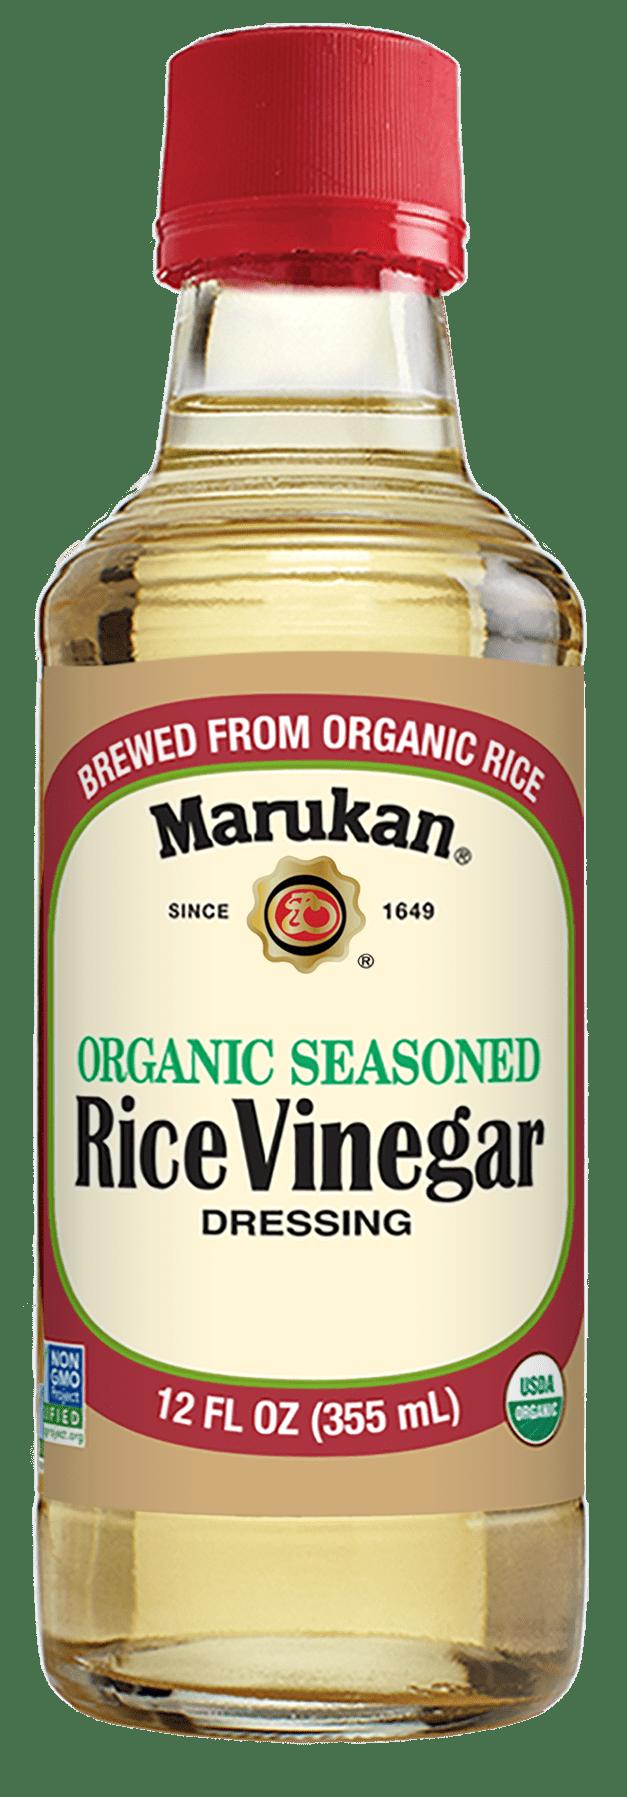 Organic Seasoned Rice Vinegar Dressing